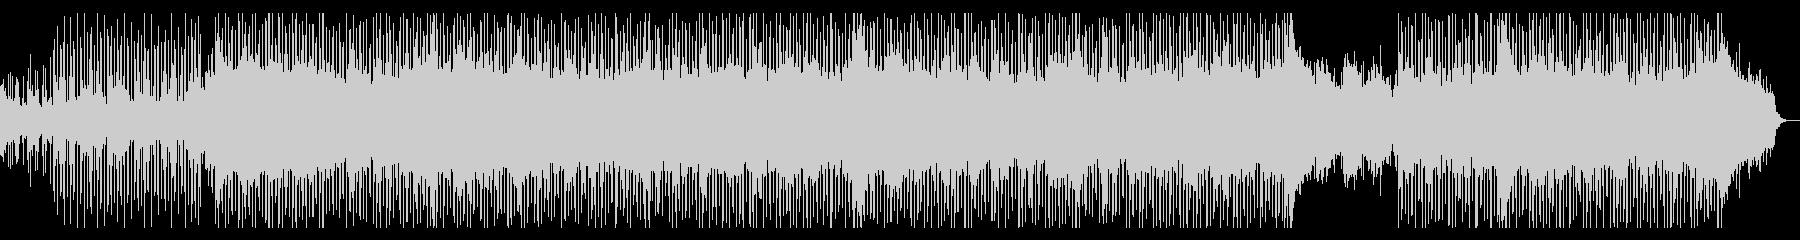 135bpm Corporate Energetic Rock Motivational's unreproduced waveform